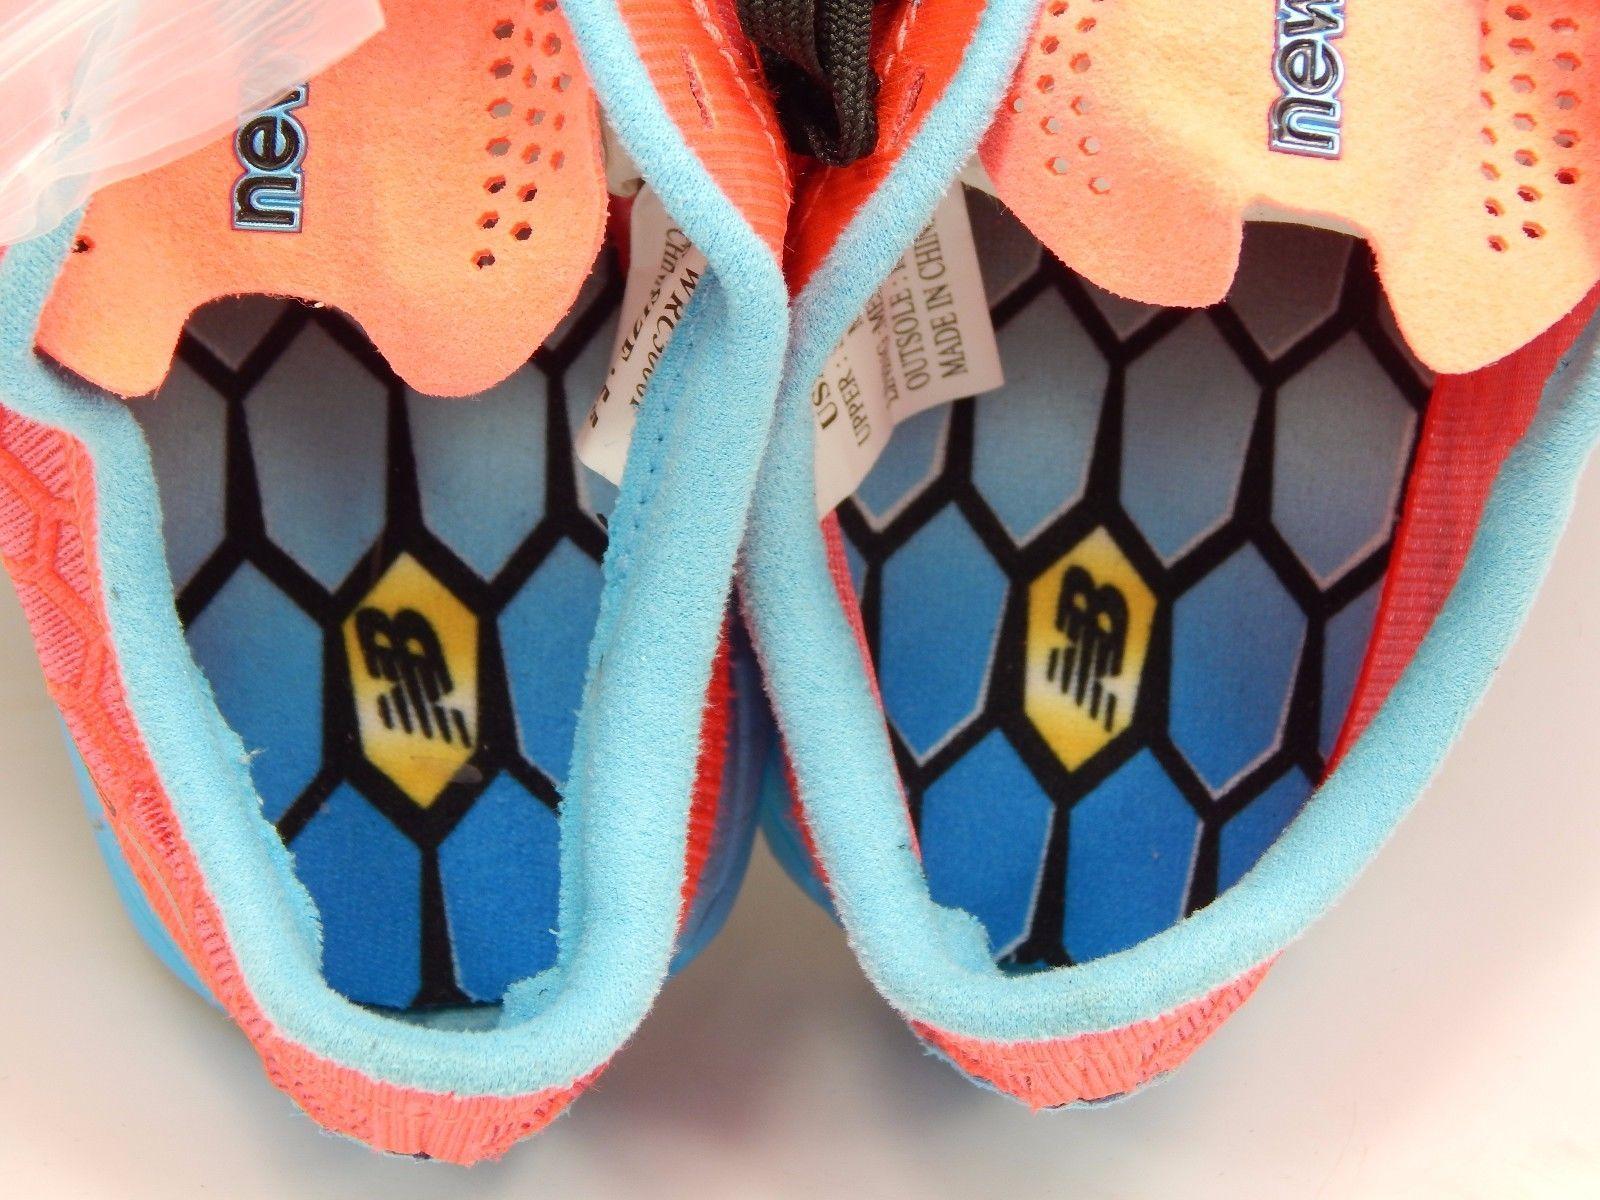 New Balance RC 5000 Women's Running Shoes Size US 5.5 M (B) EU 36 Pink WRC5000P